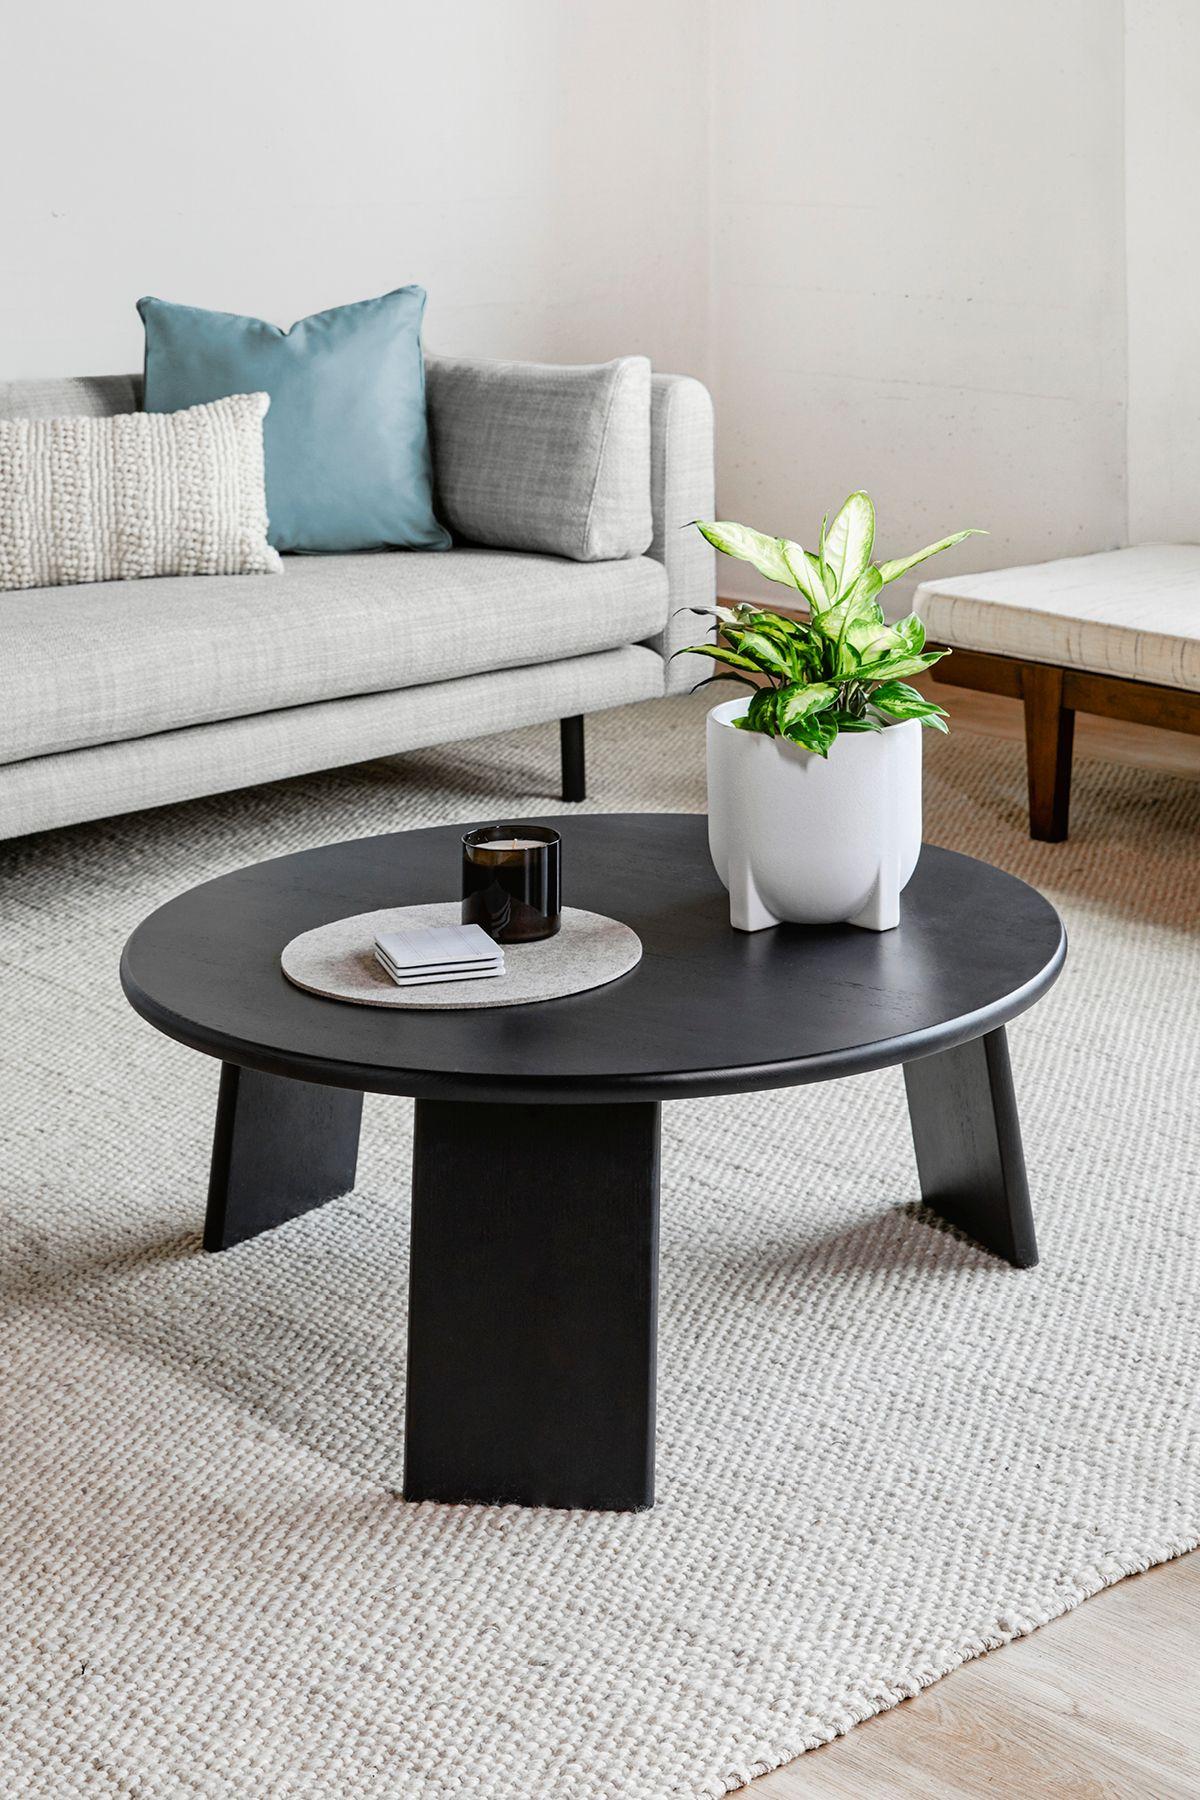 Uddo Ash Coffee Table Coffee Table Mid Century Modern Coffee Table Living Room Decor Furniture [ 1800 x 1200 Pixel ]